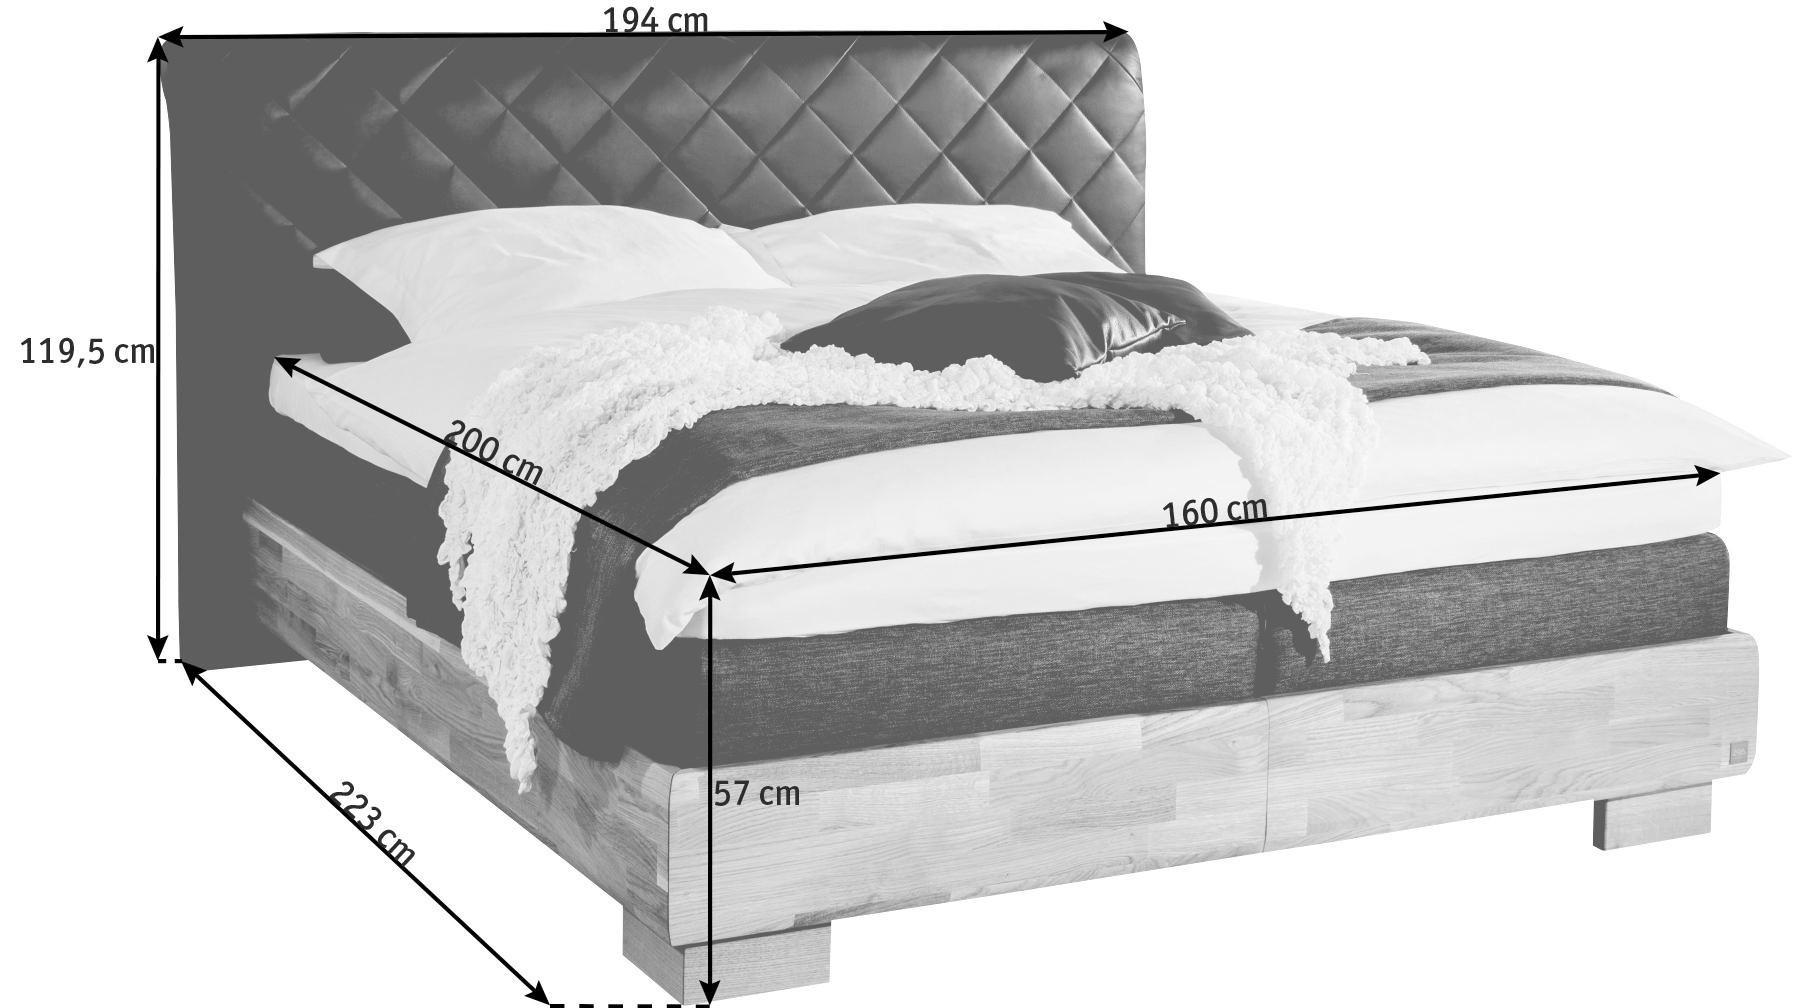 BOXSPRINGBETT 160/200 cm  INKL. Matratze, Topper - Eichefarben/Braun, KONVENTIONELL, Leder/Holz (160/200cm) - NOVEL